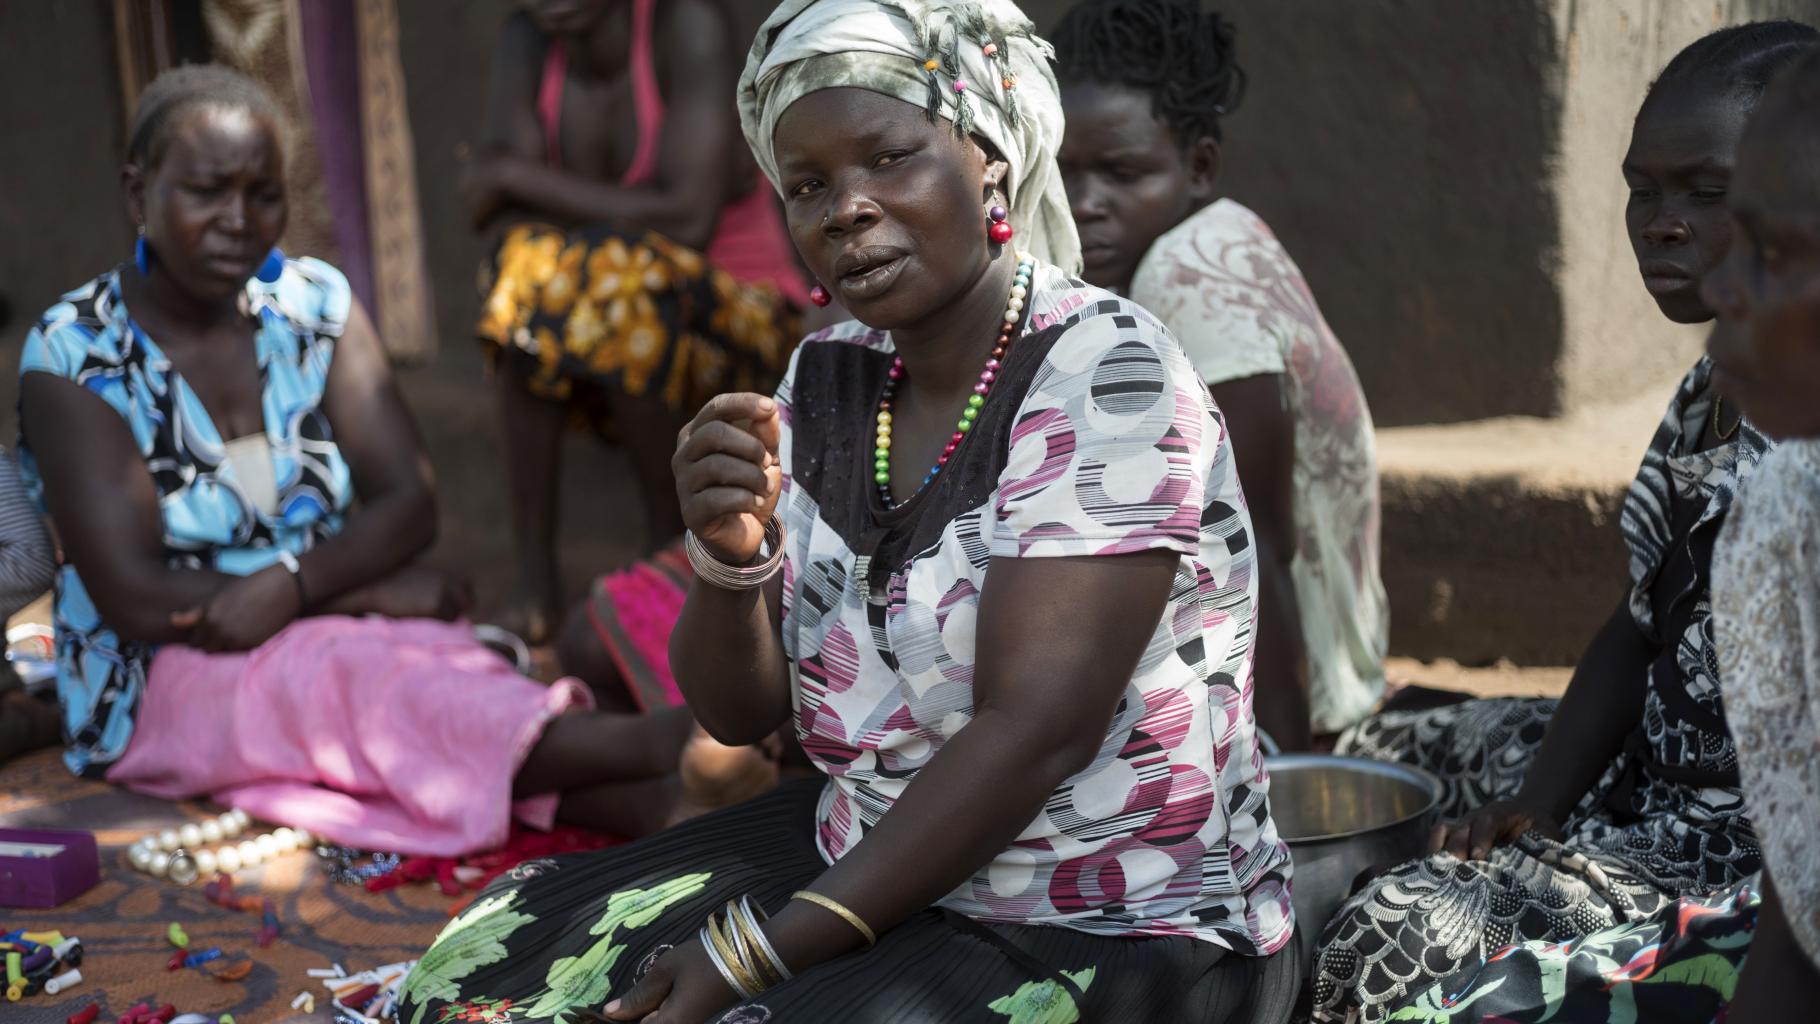 Sarah aus Südsudan in einer Flüchtlingssiedlung in Uganda